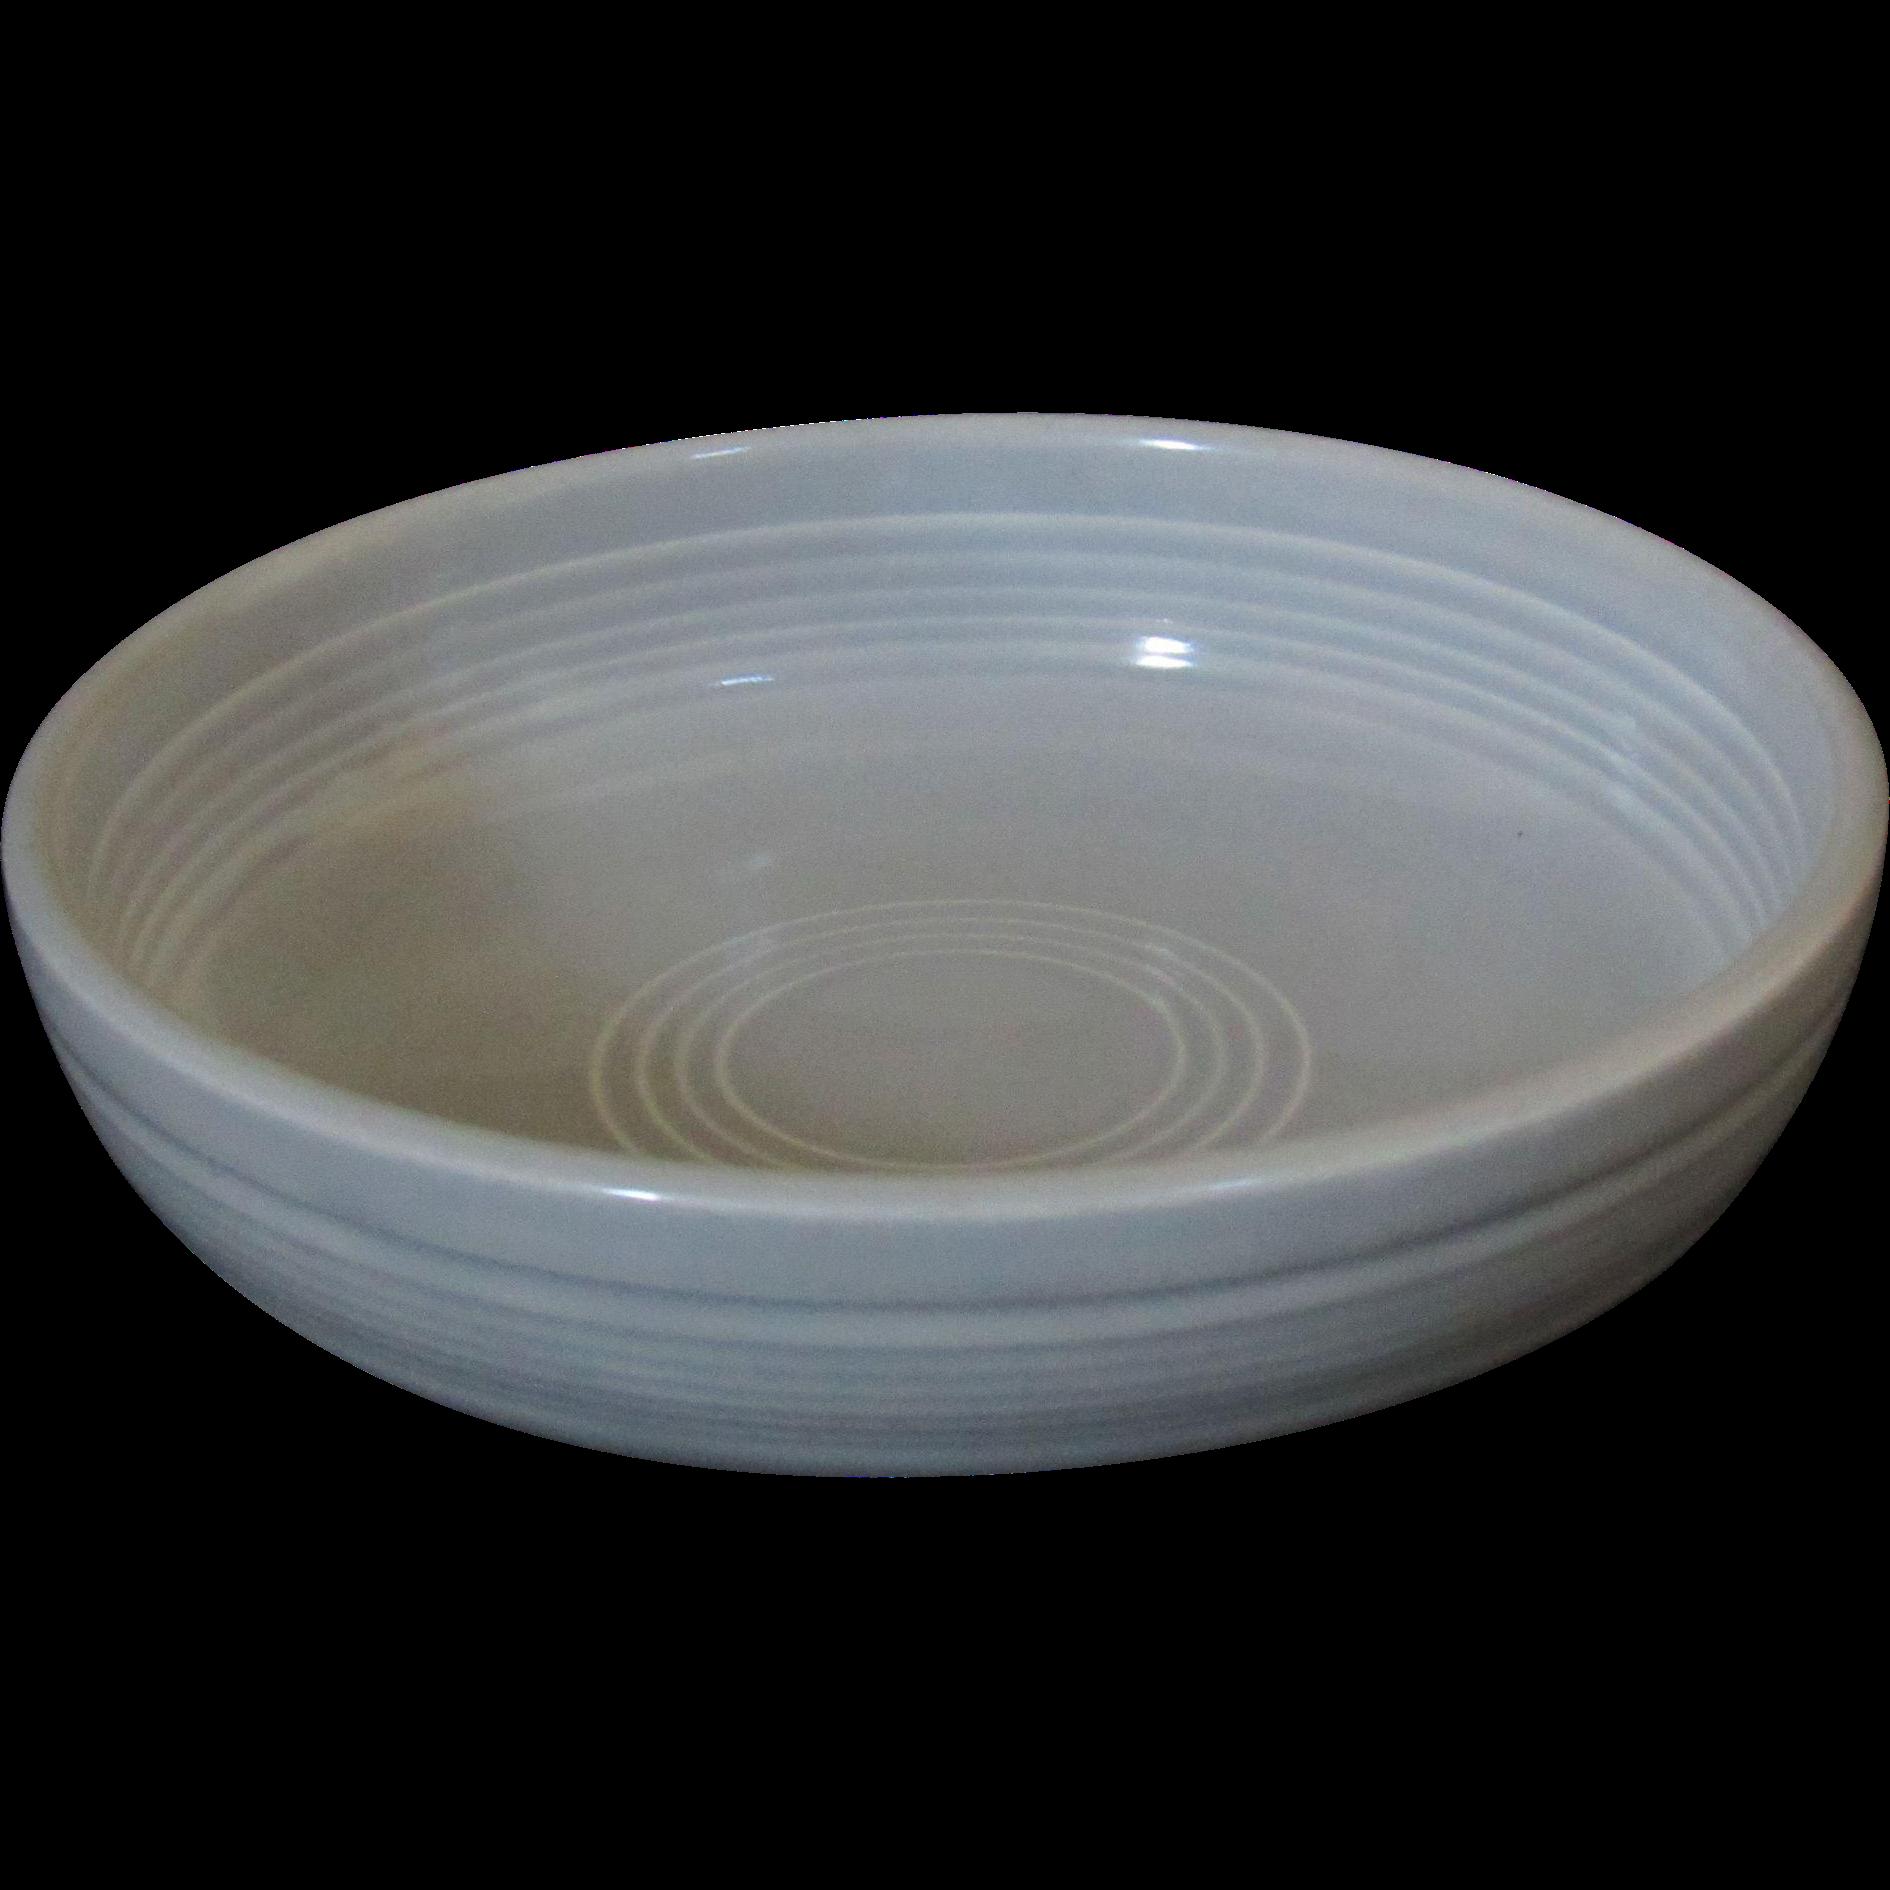 Fiesta Gray Dessert Bowl